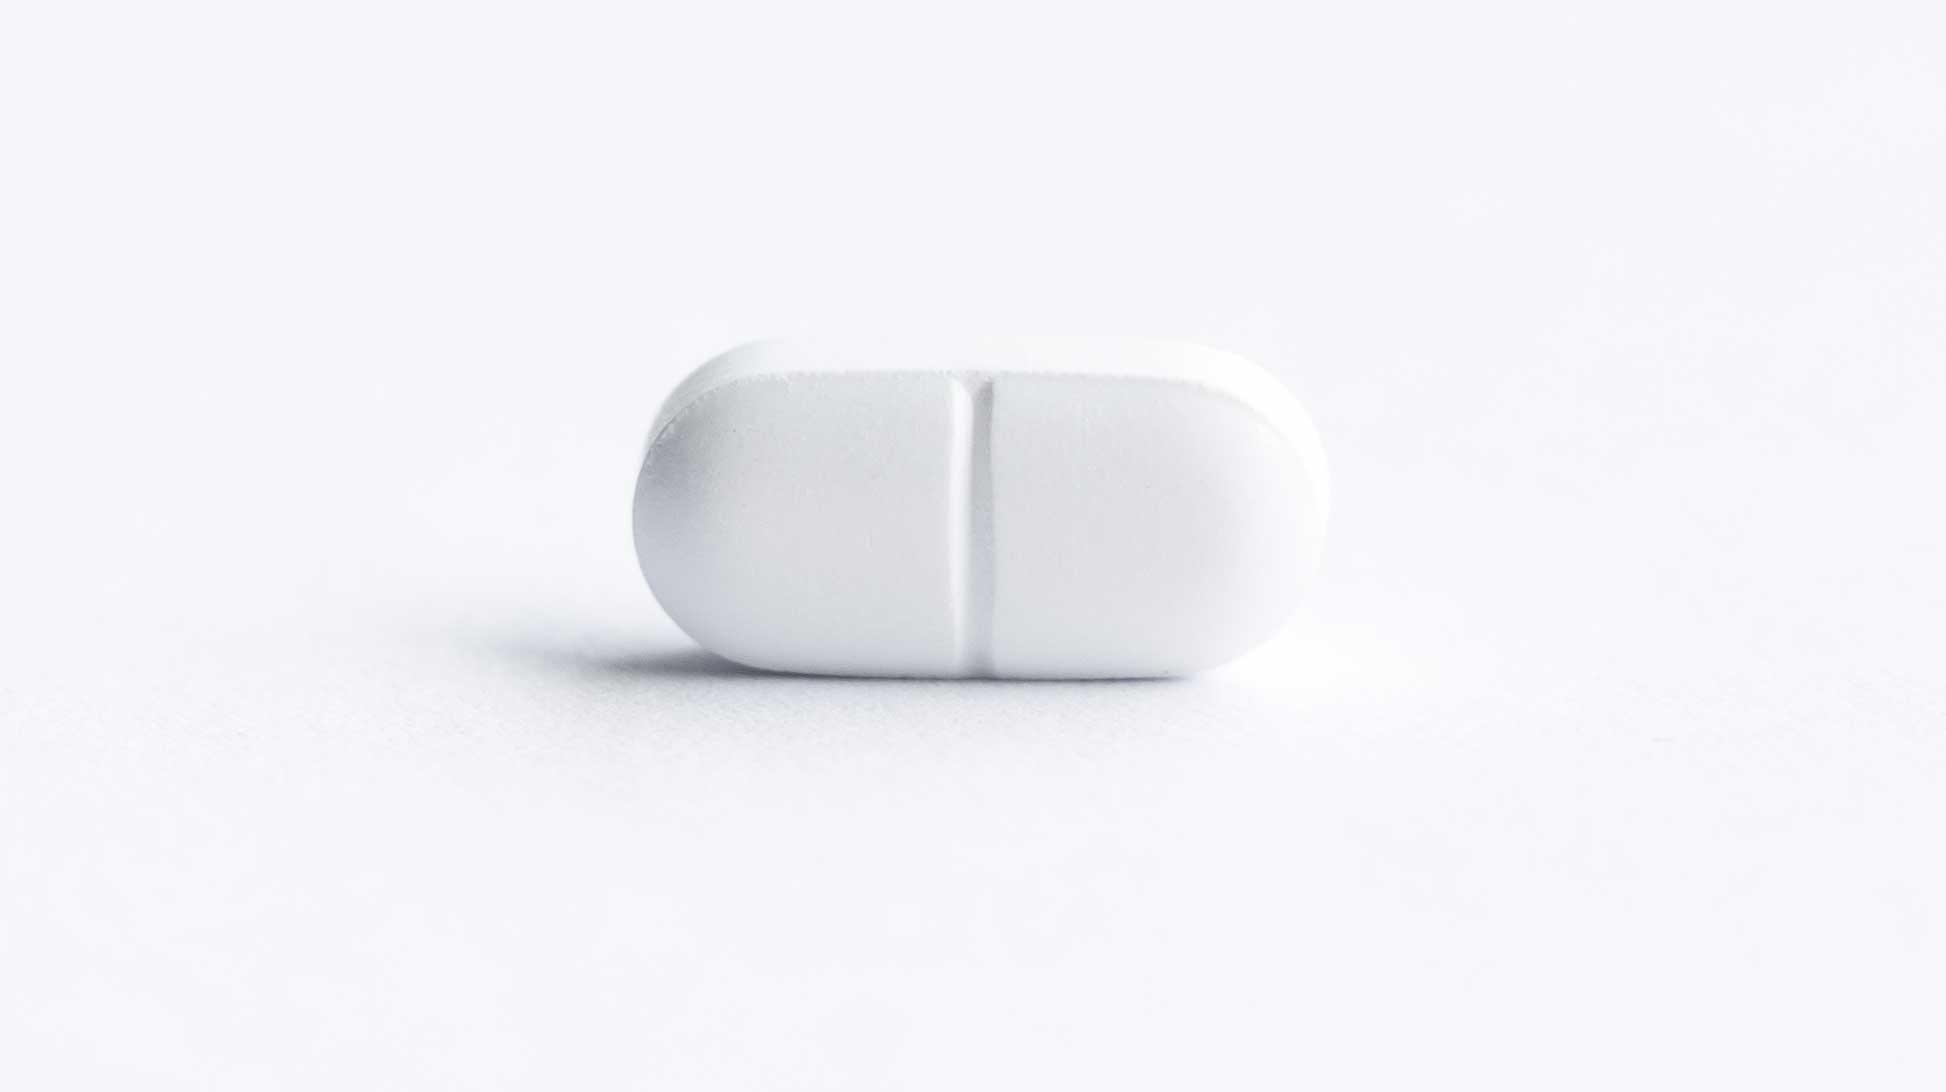 Short-Term Effects Of Opioid Drug Addiction